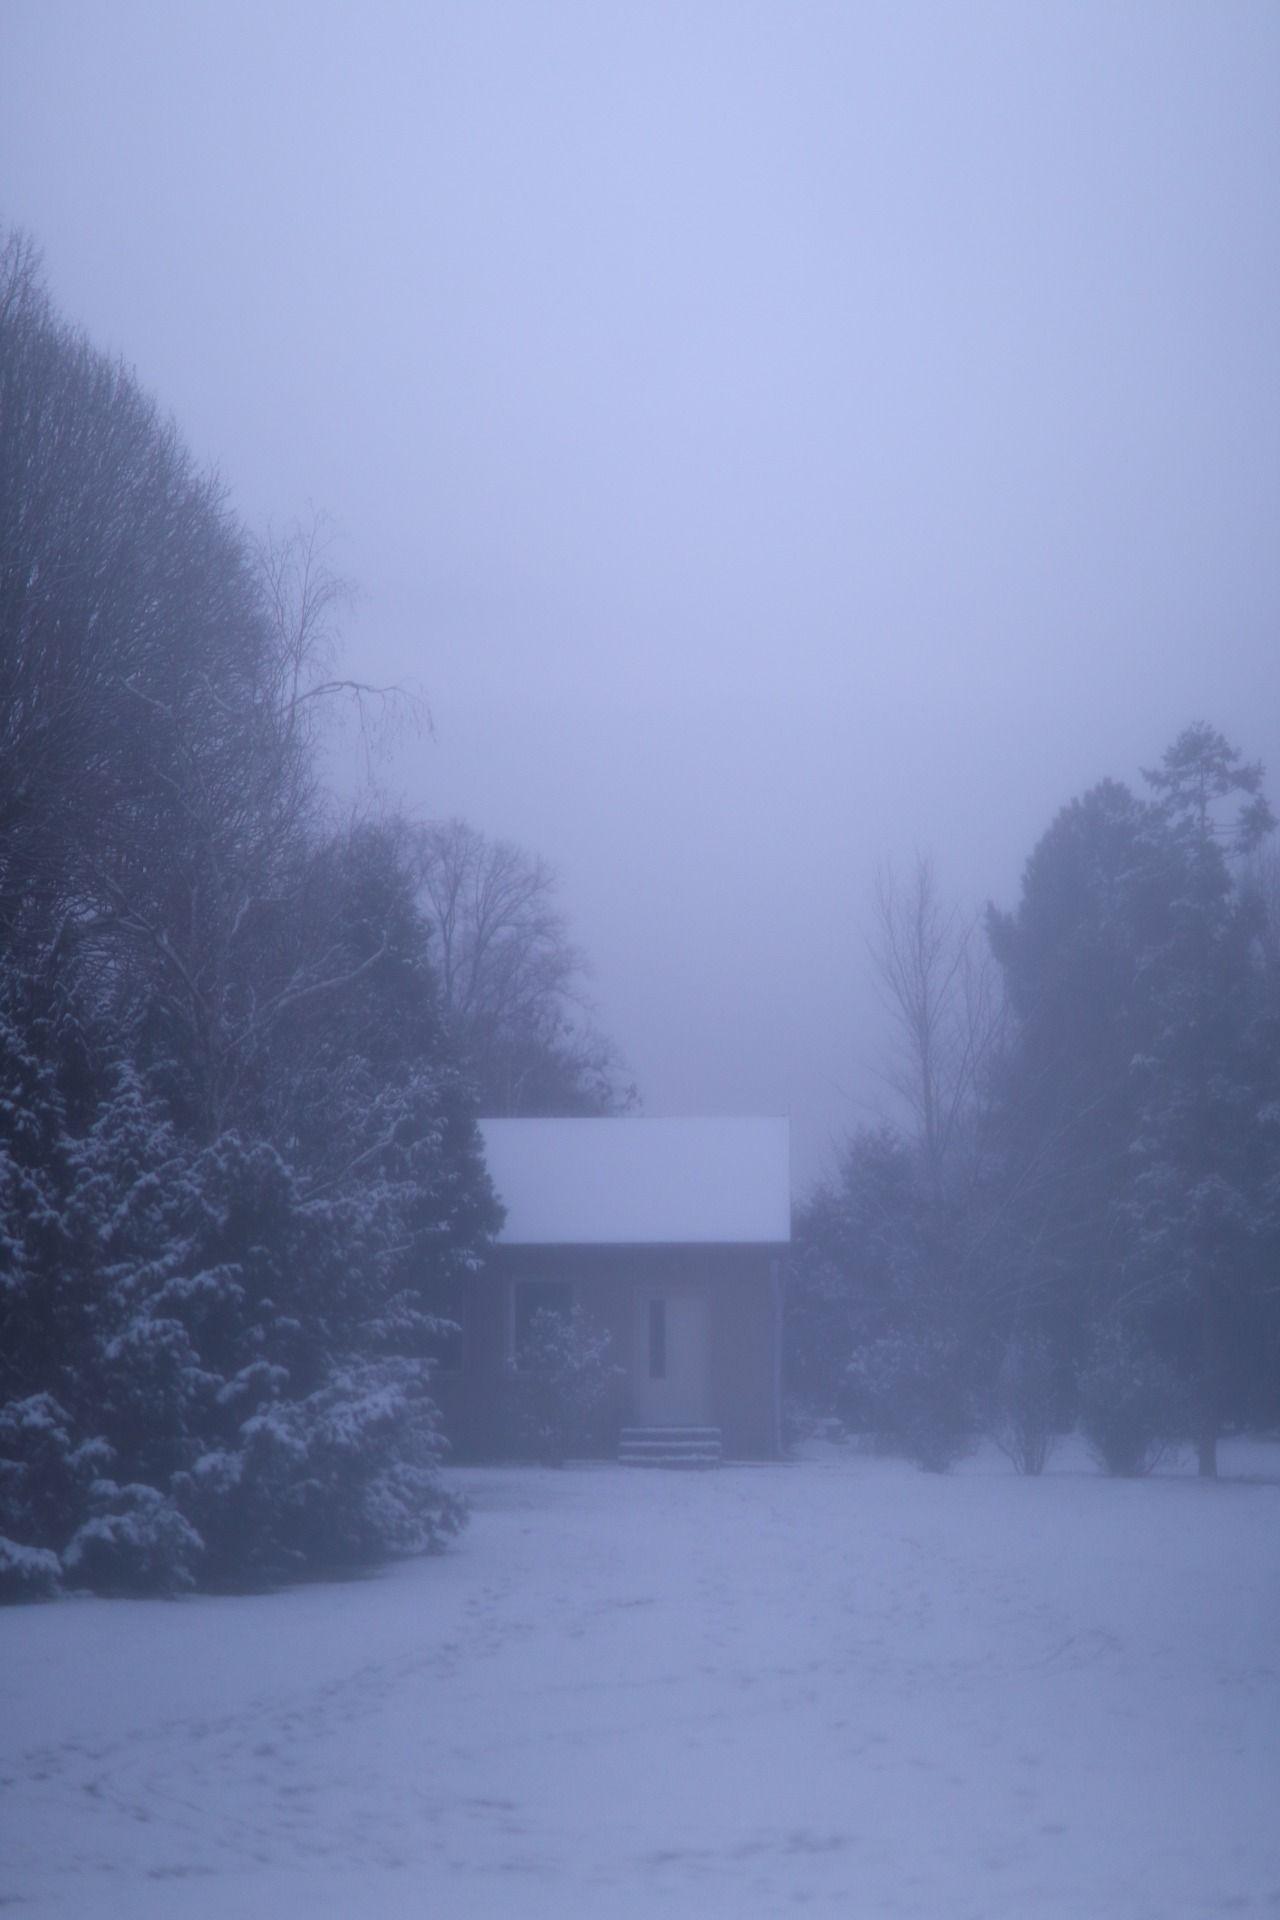 Winter Guest Berlin Botanischer Edit Fog Friday Garten Meolog No On Original Pankow Photographers Snow Source Tumblr Wint Pankow Guest Winter